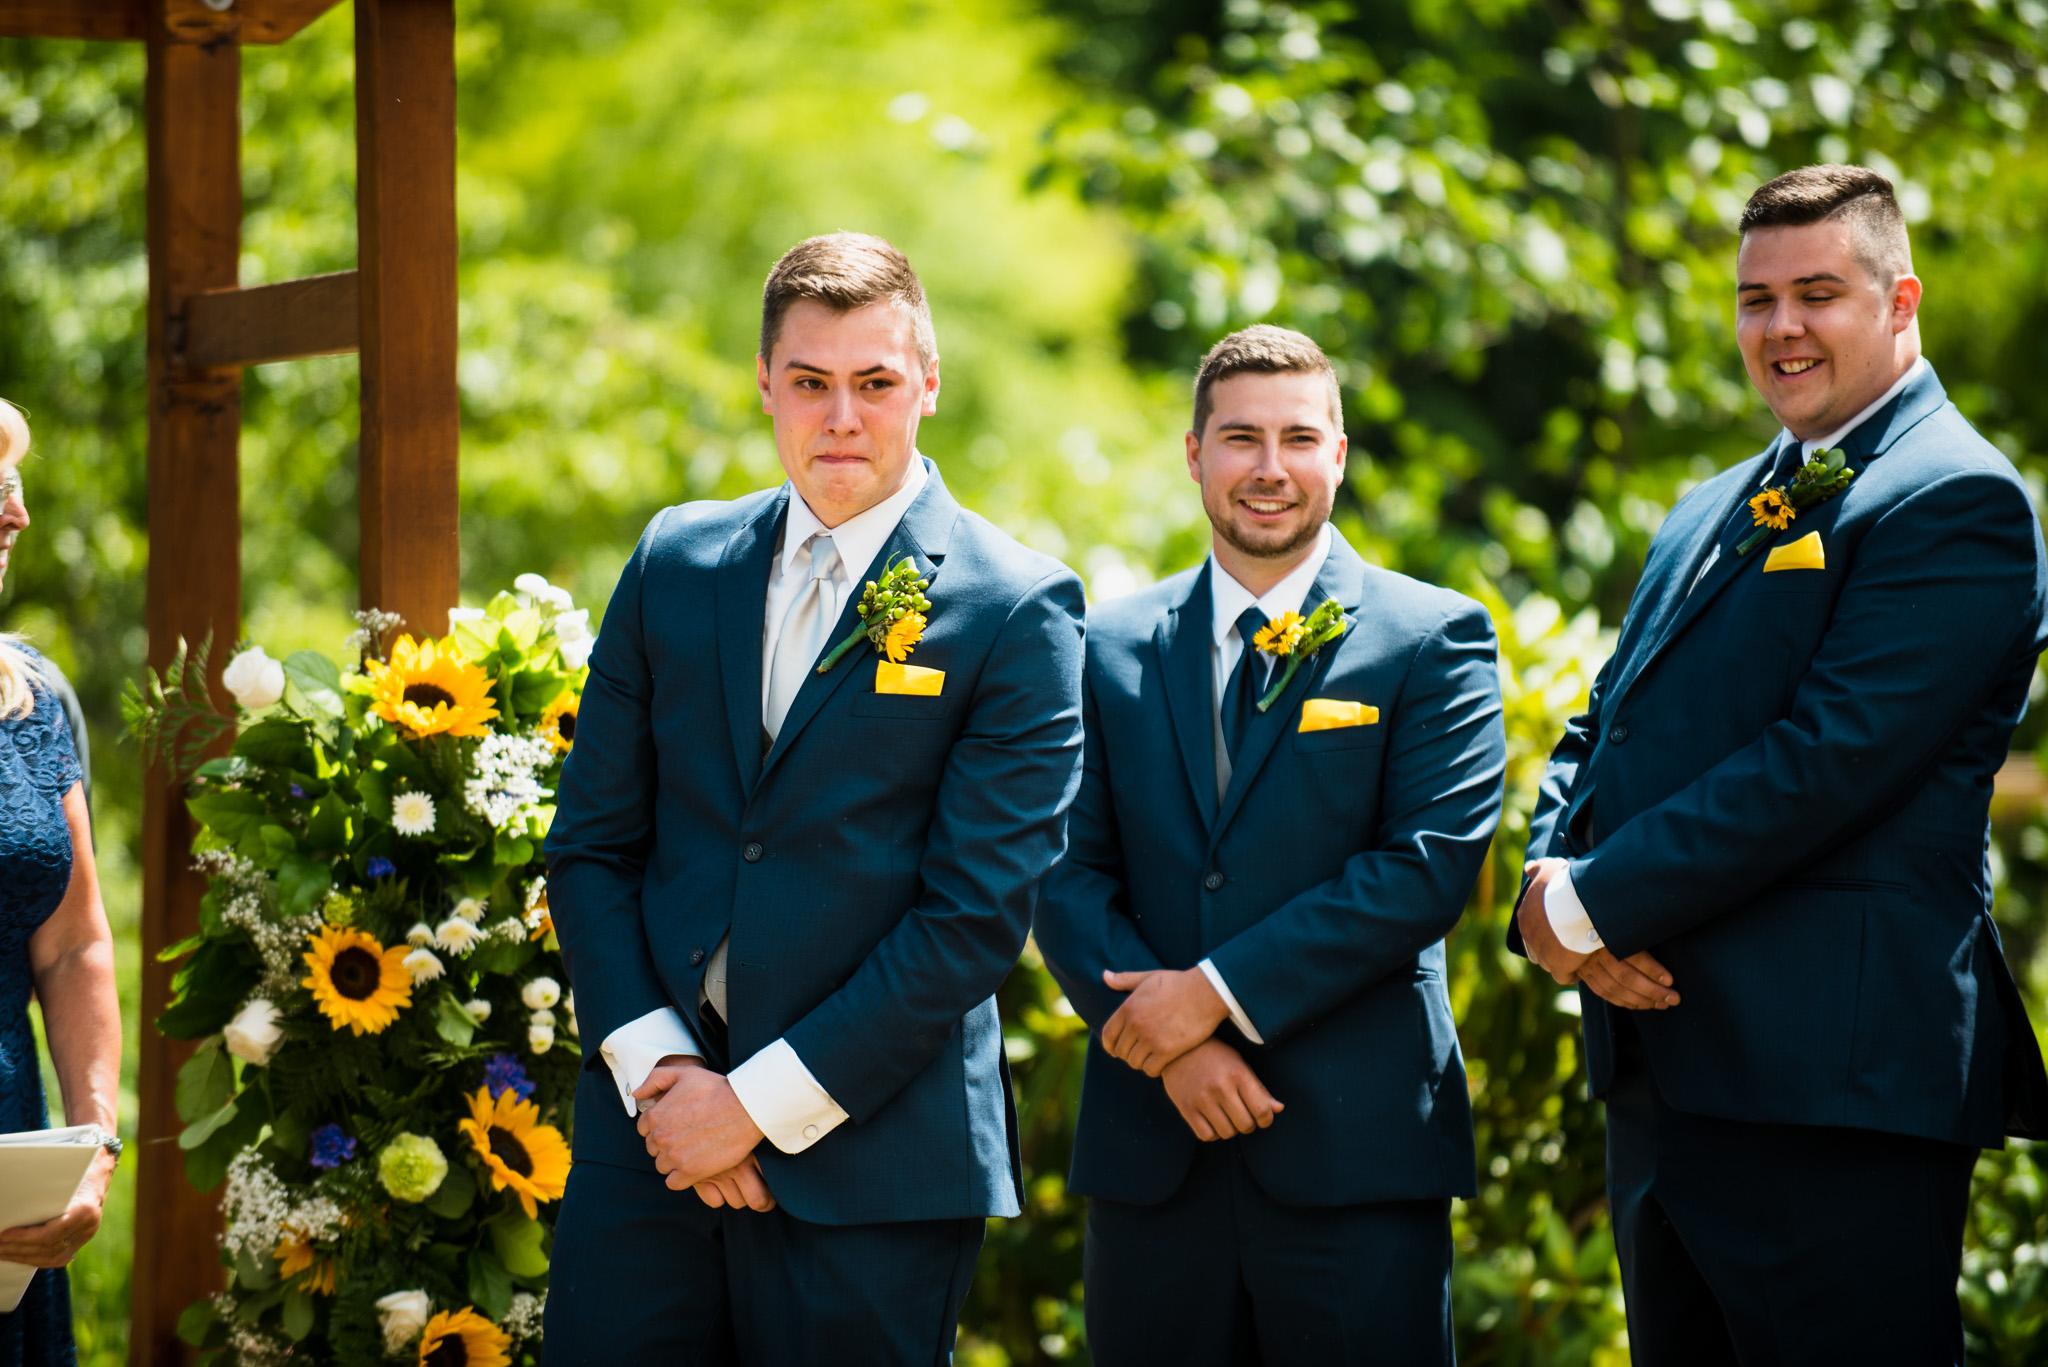 victoria-wedding-photographers-prospect-community-hall-wedding-22.jpg